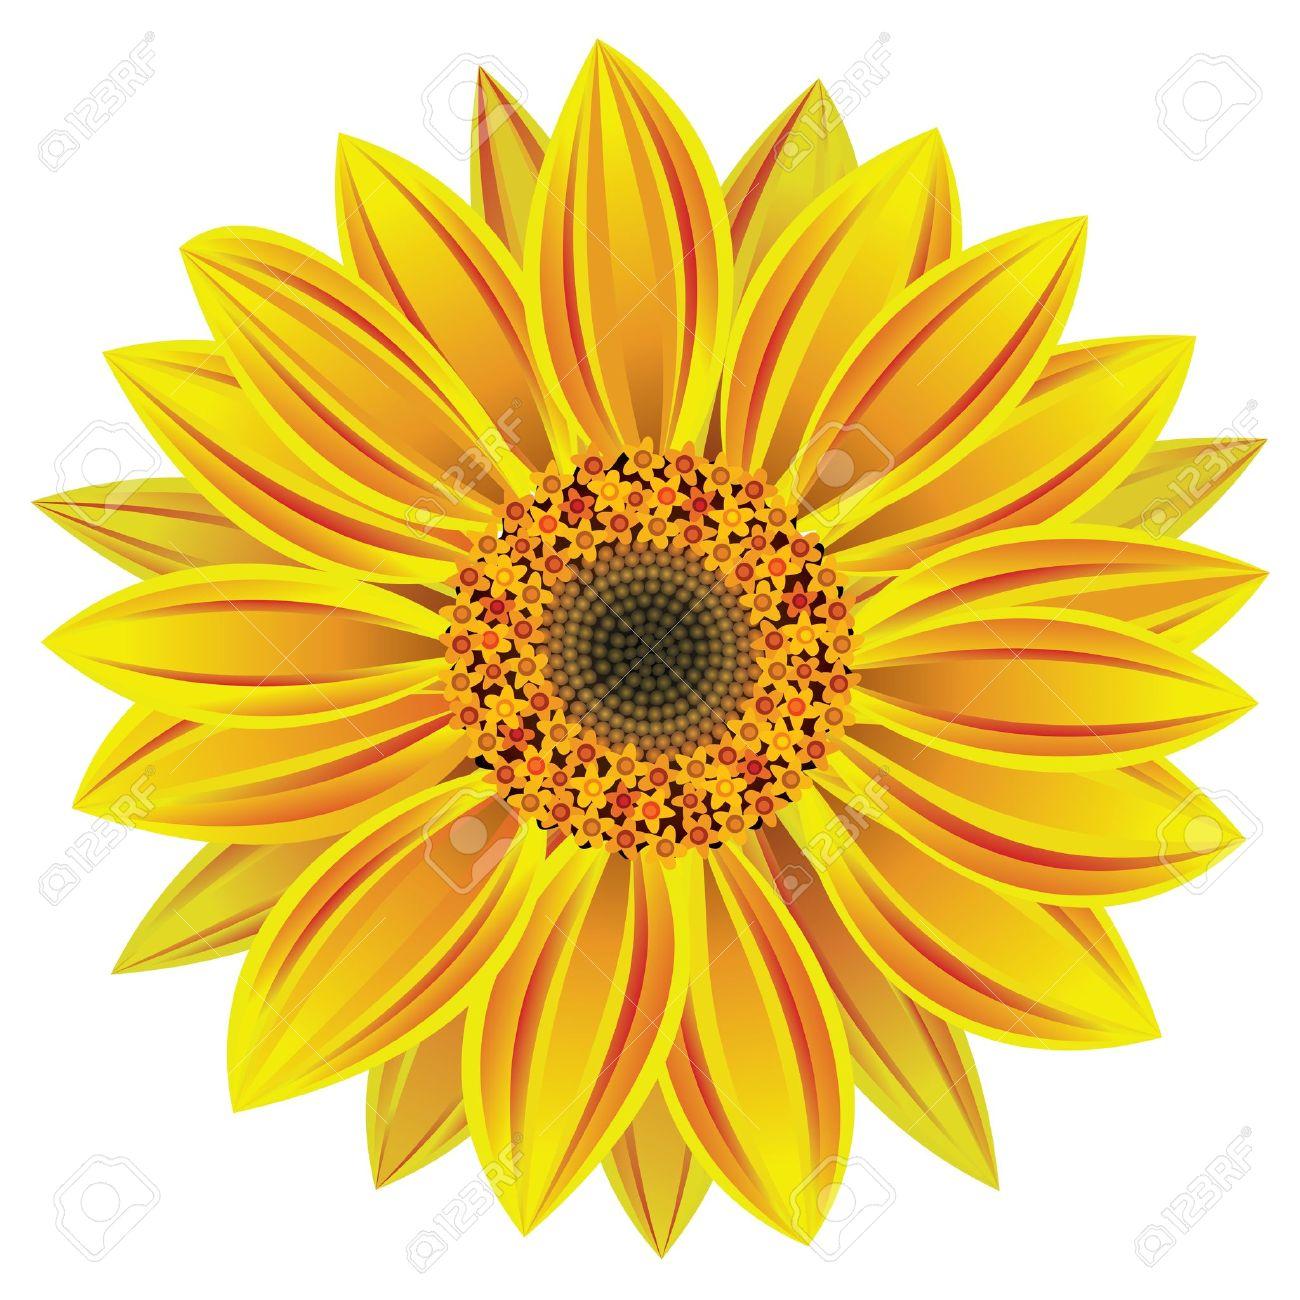 Wallpapermisc Single Sunflower Hd Wallpapers Free Top Single